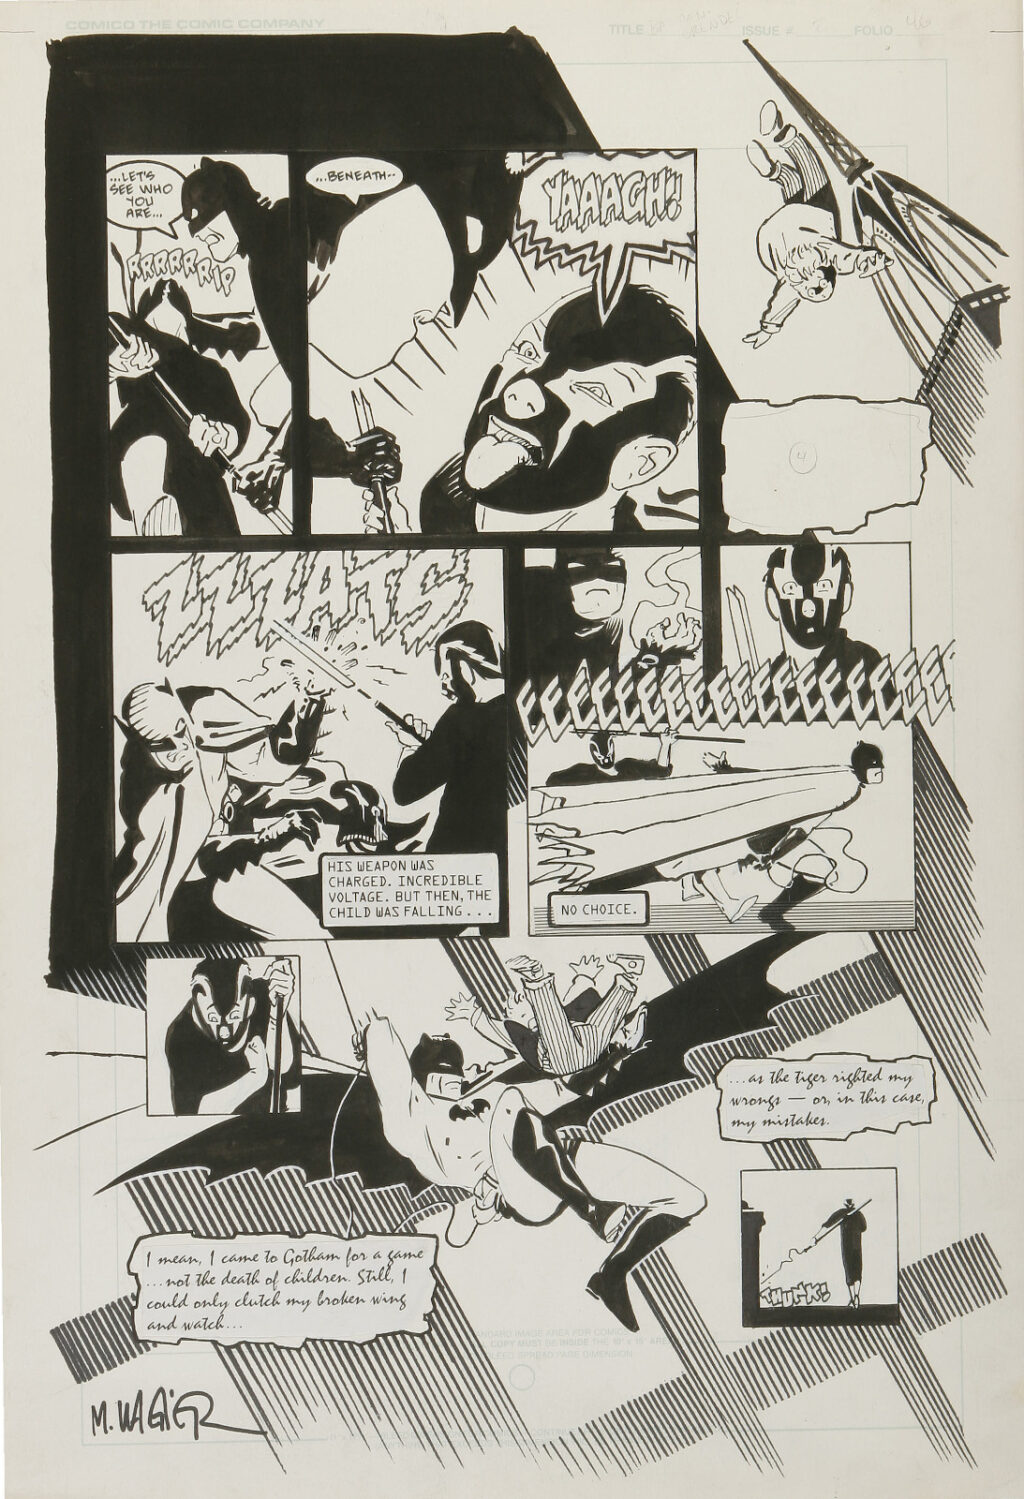 Batman Grendel Devils Masque issue 2 page 46 by Matt Wagner and Joe Matt